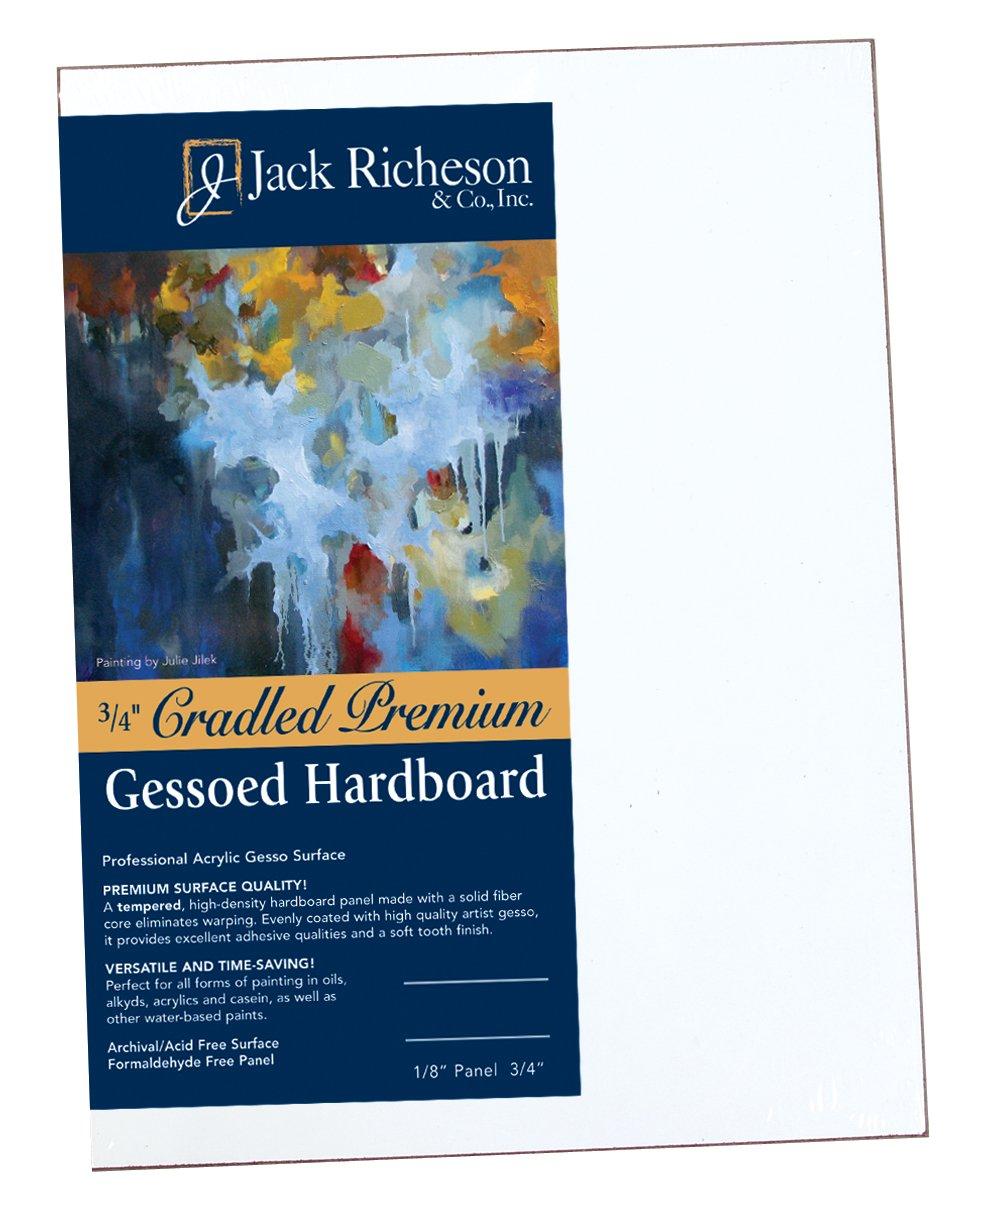 Jack Richeson 3/4-Inch Premium Tempered Gessoed Hardboard Panel, 12-Inch by 16-Inch by Jack Richeson